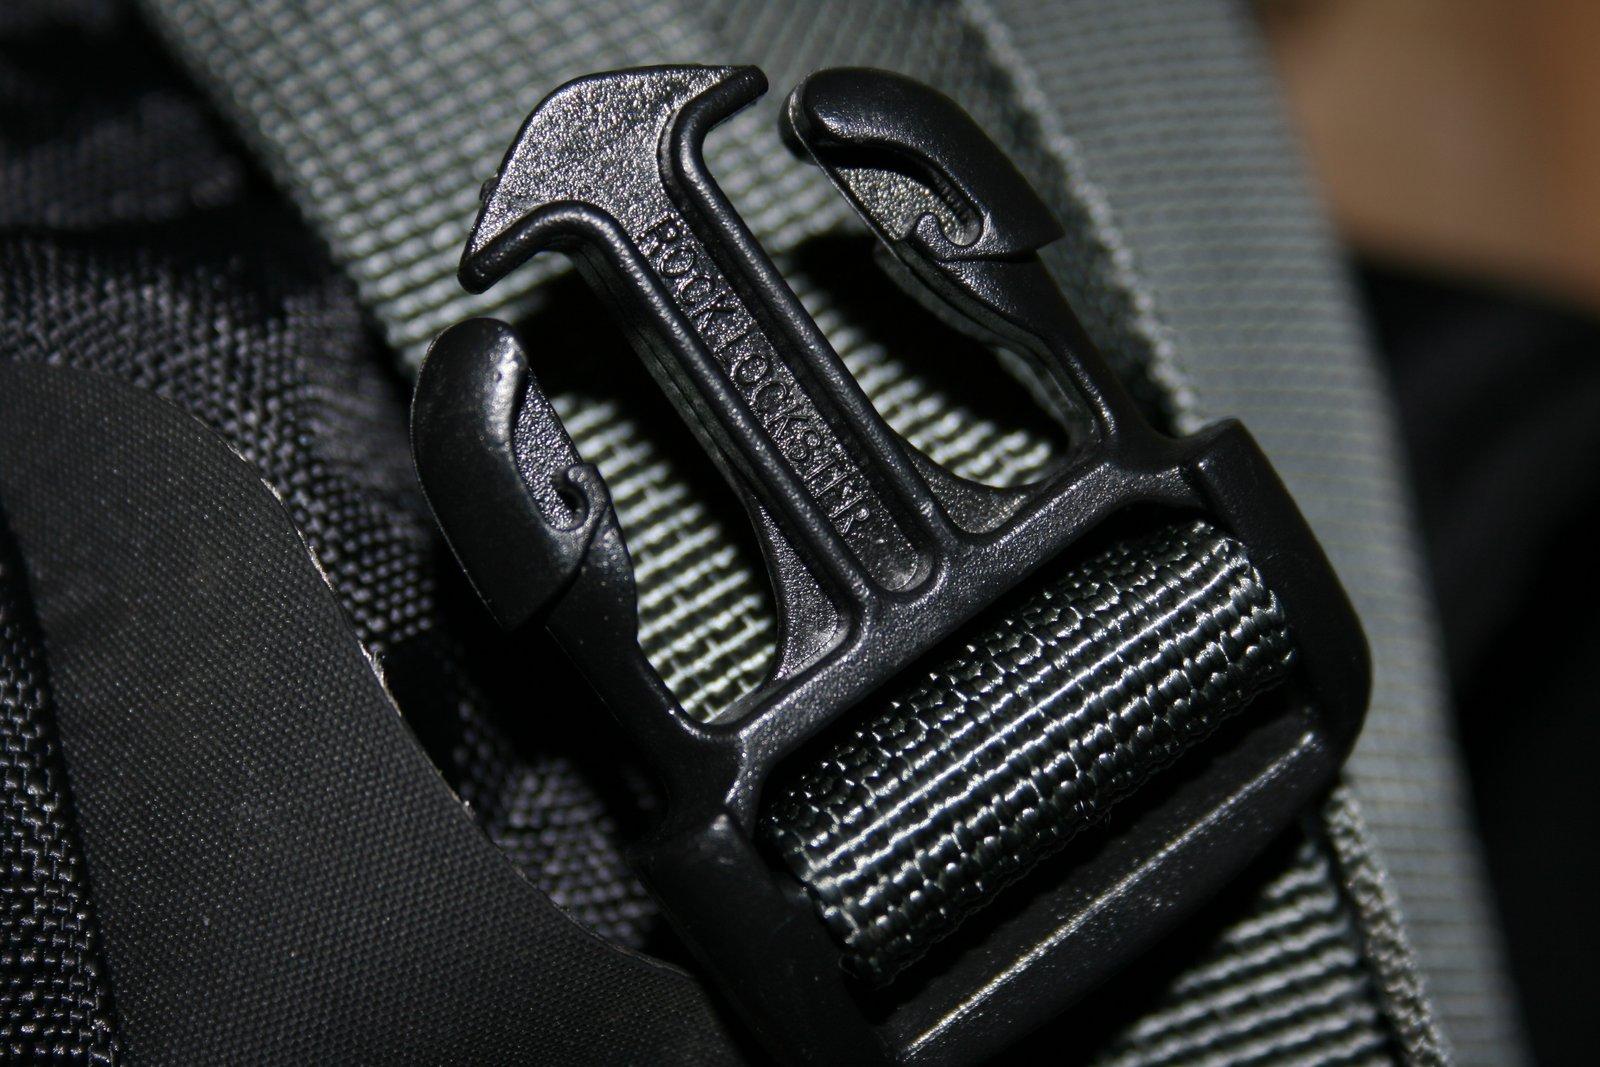 Backpack Buckle Closeup